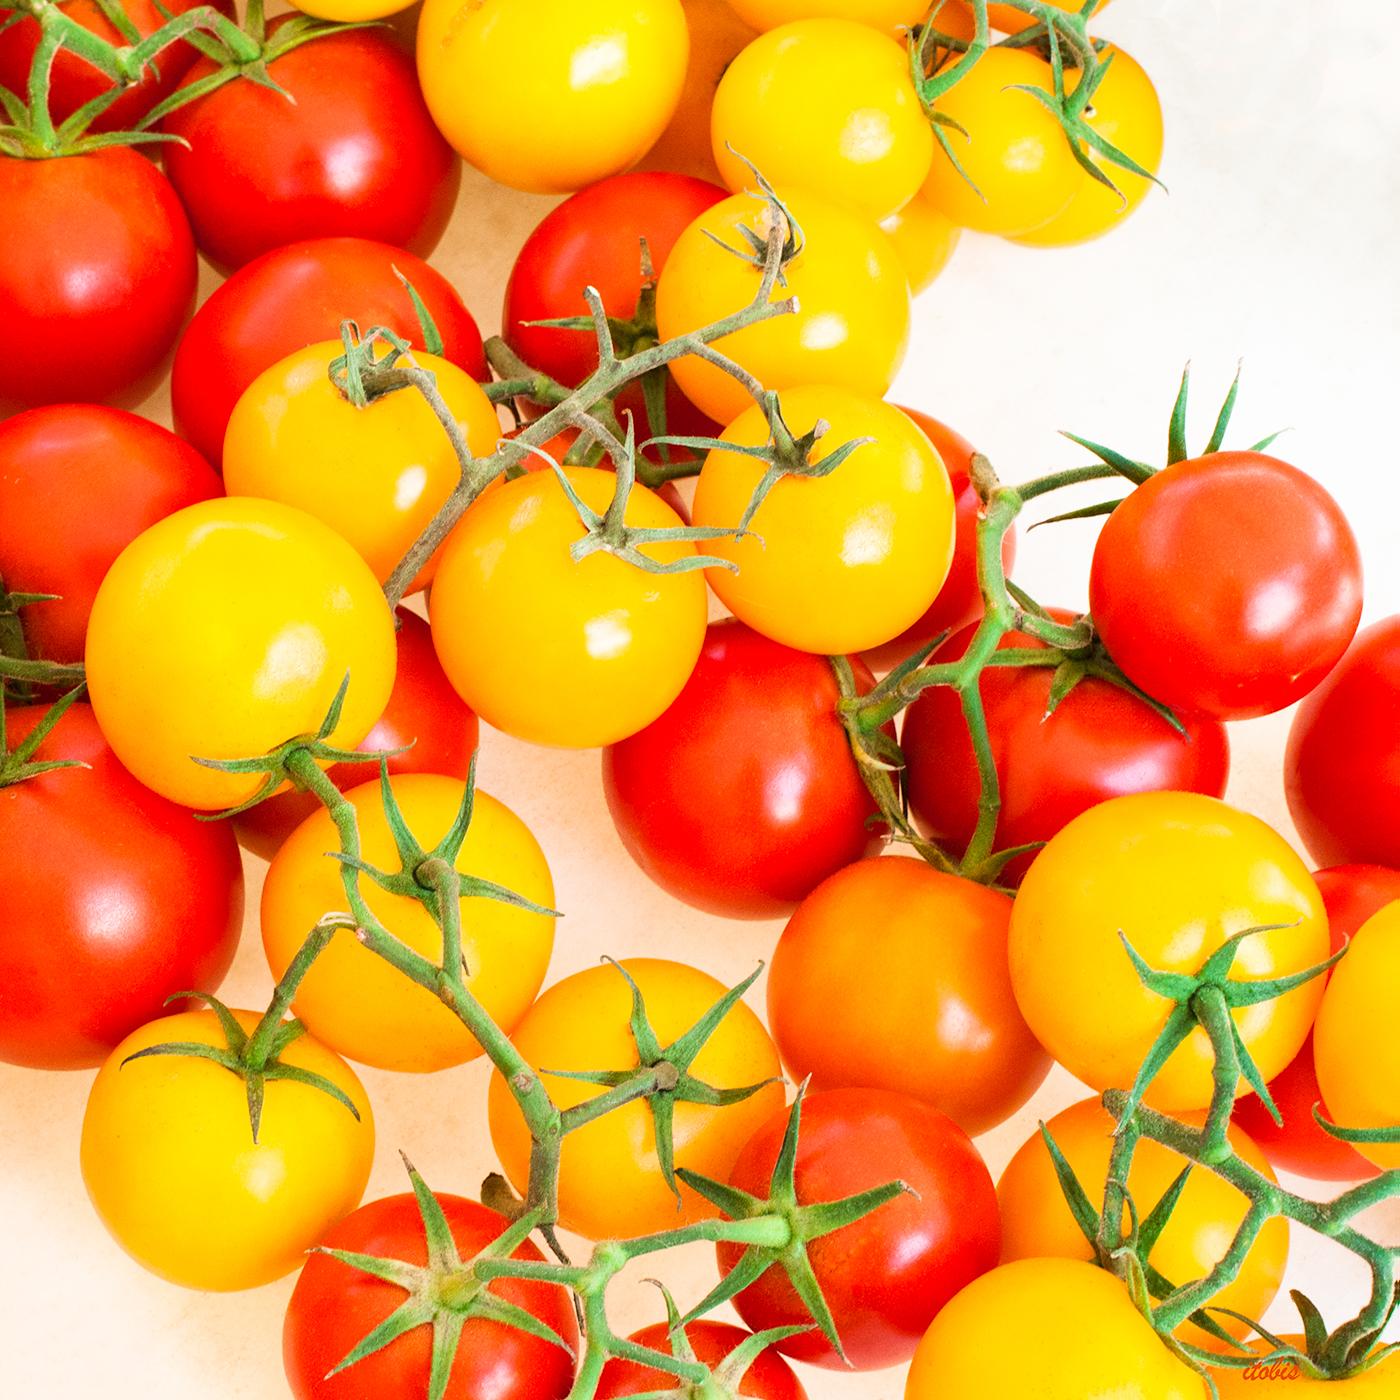 KITCHEN PHOTO BOARD : Tomatoes on the Vine - Ingleside Tomatoes - Ottawa Farmers' Market, Lansdowne Park - photo by Irene Tobis